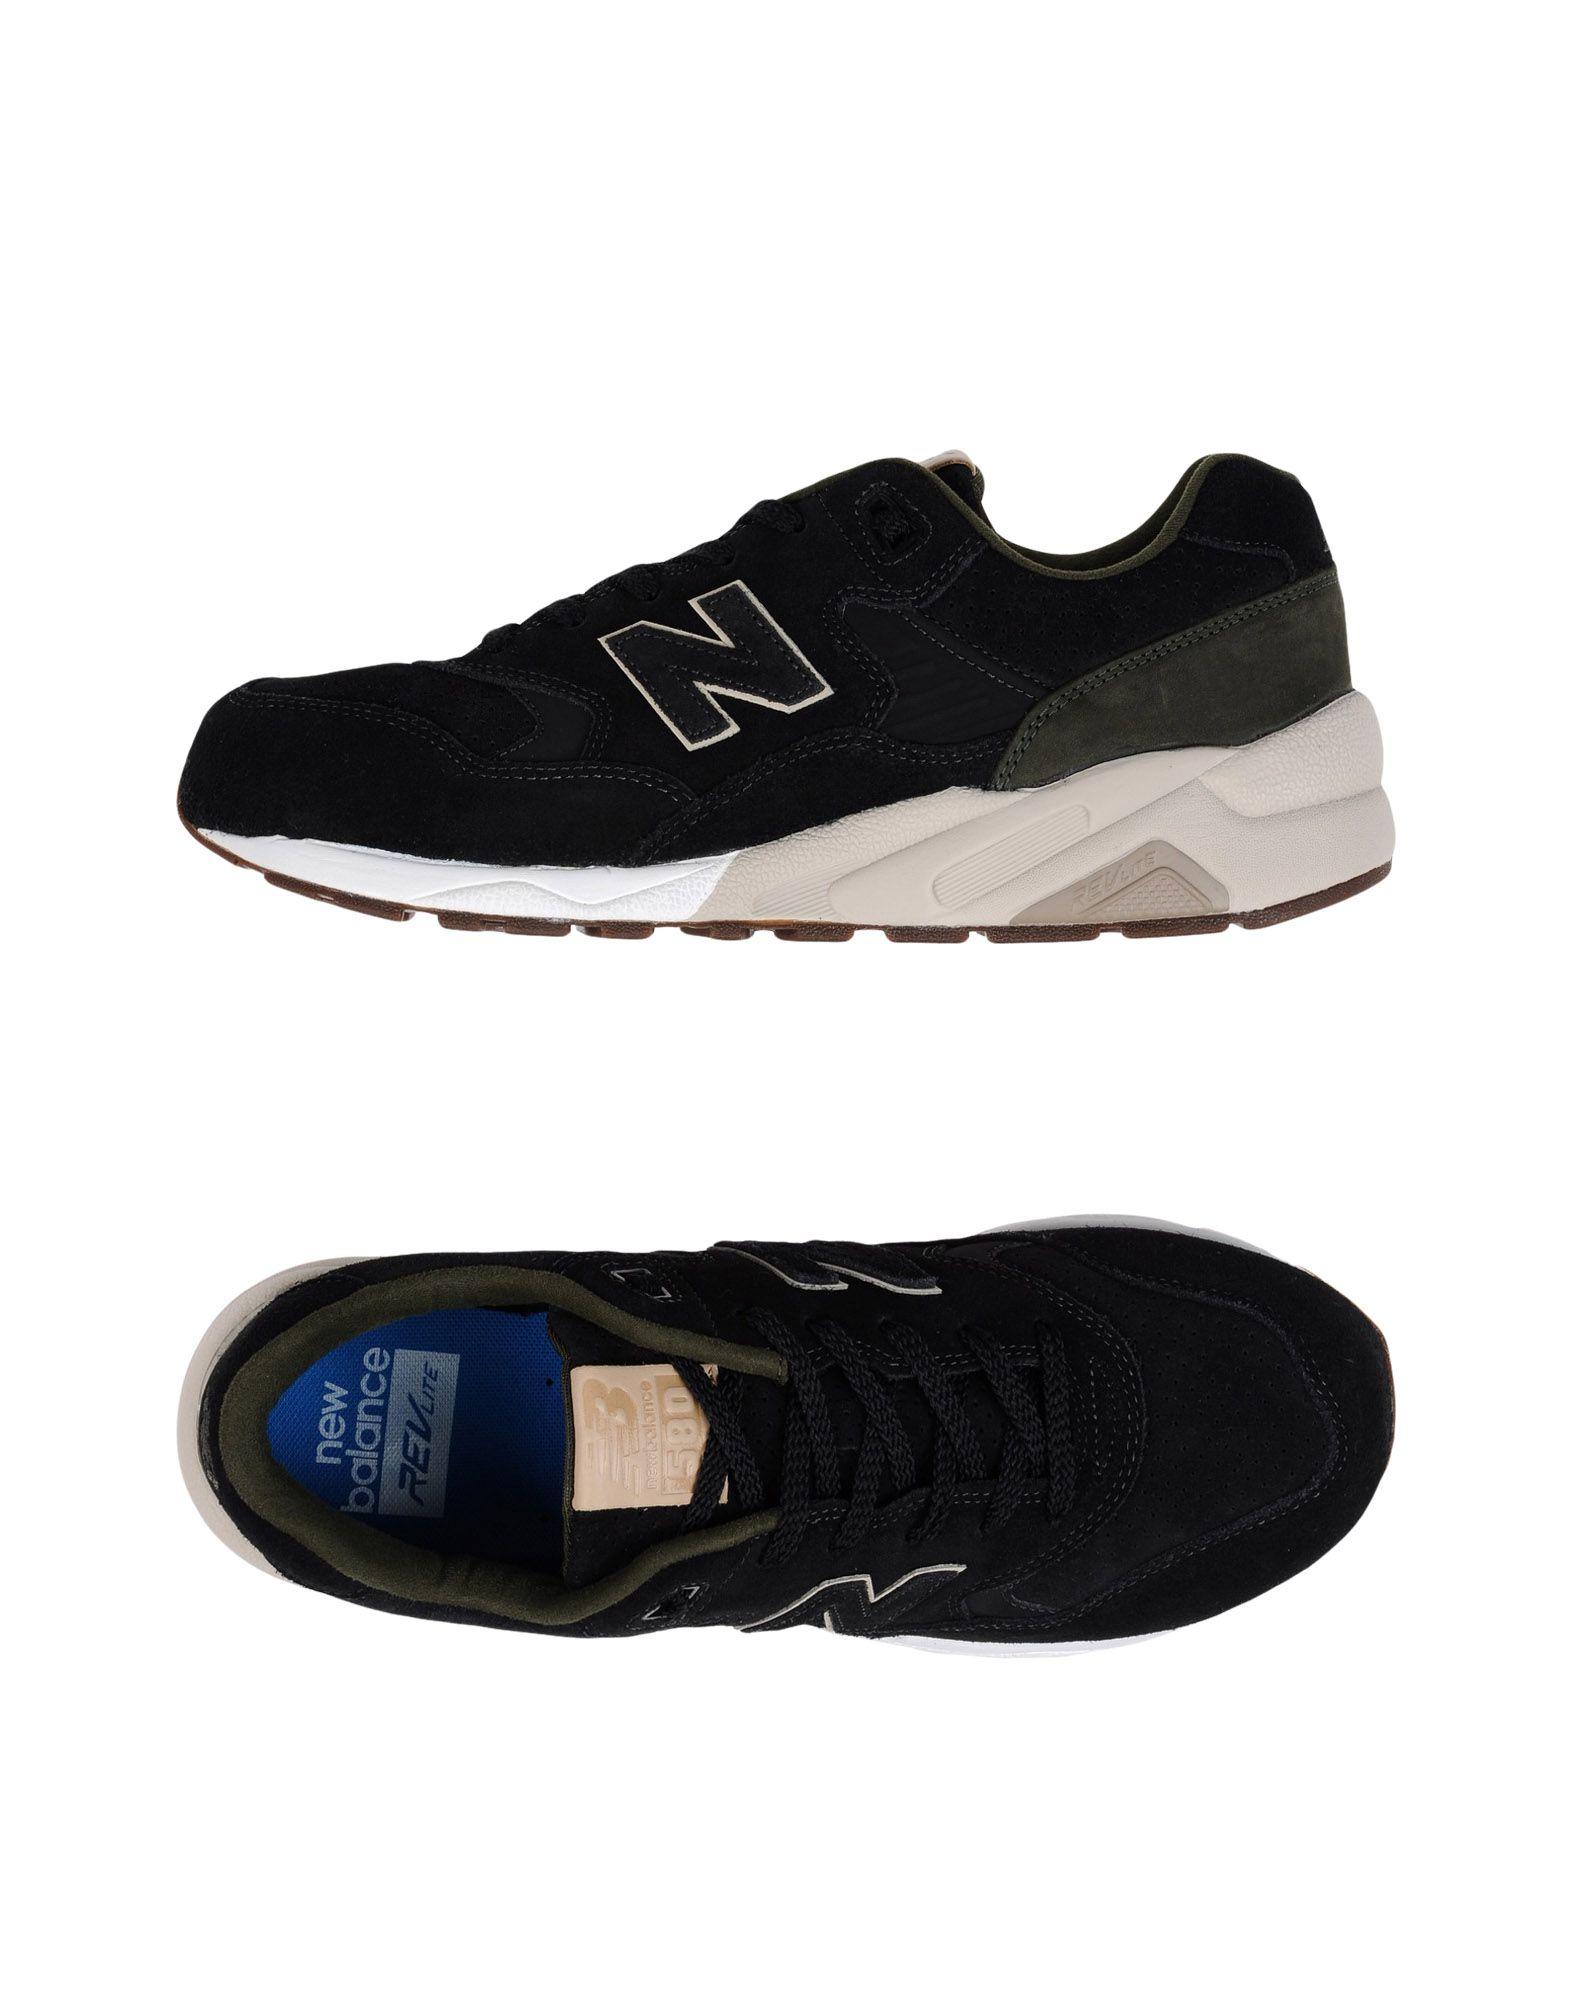 Sneakers New Balance 580 Suede - Mesh 90S Running - Uomo - Acquista online su